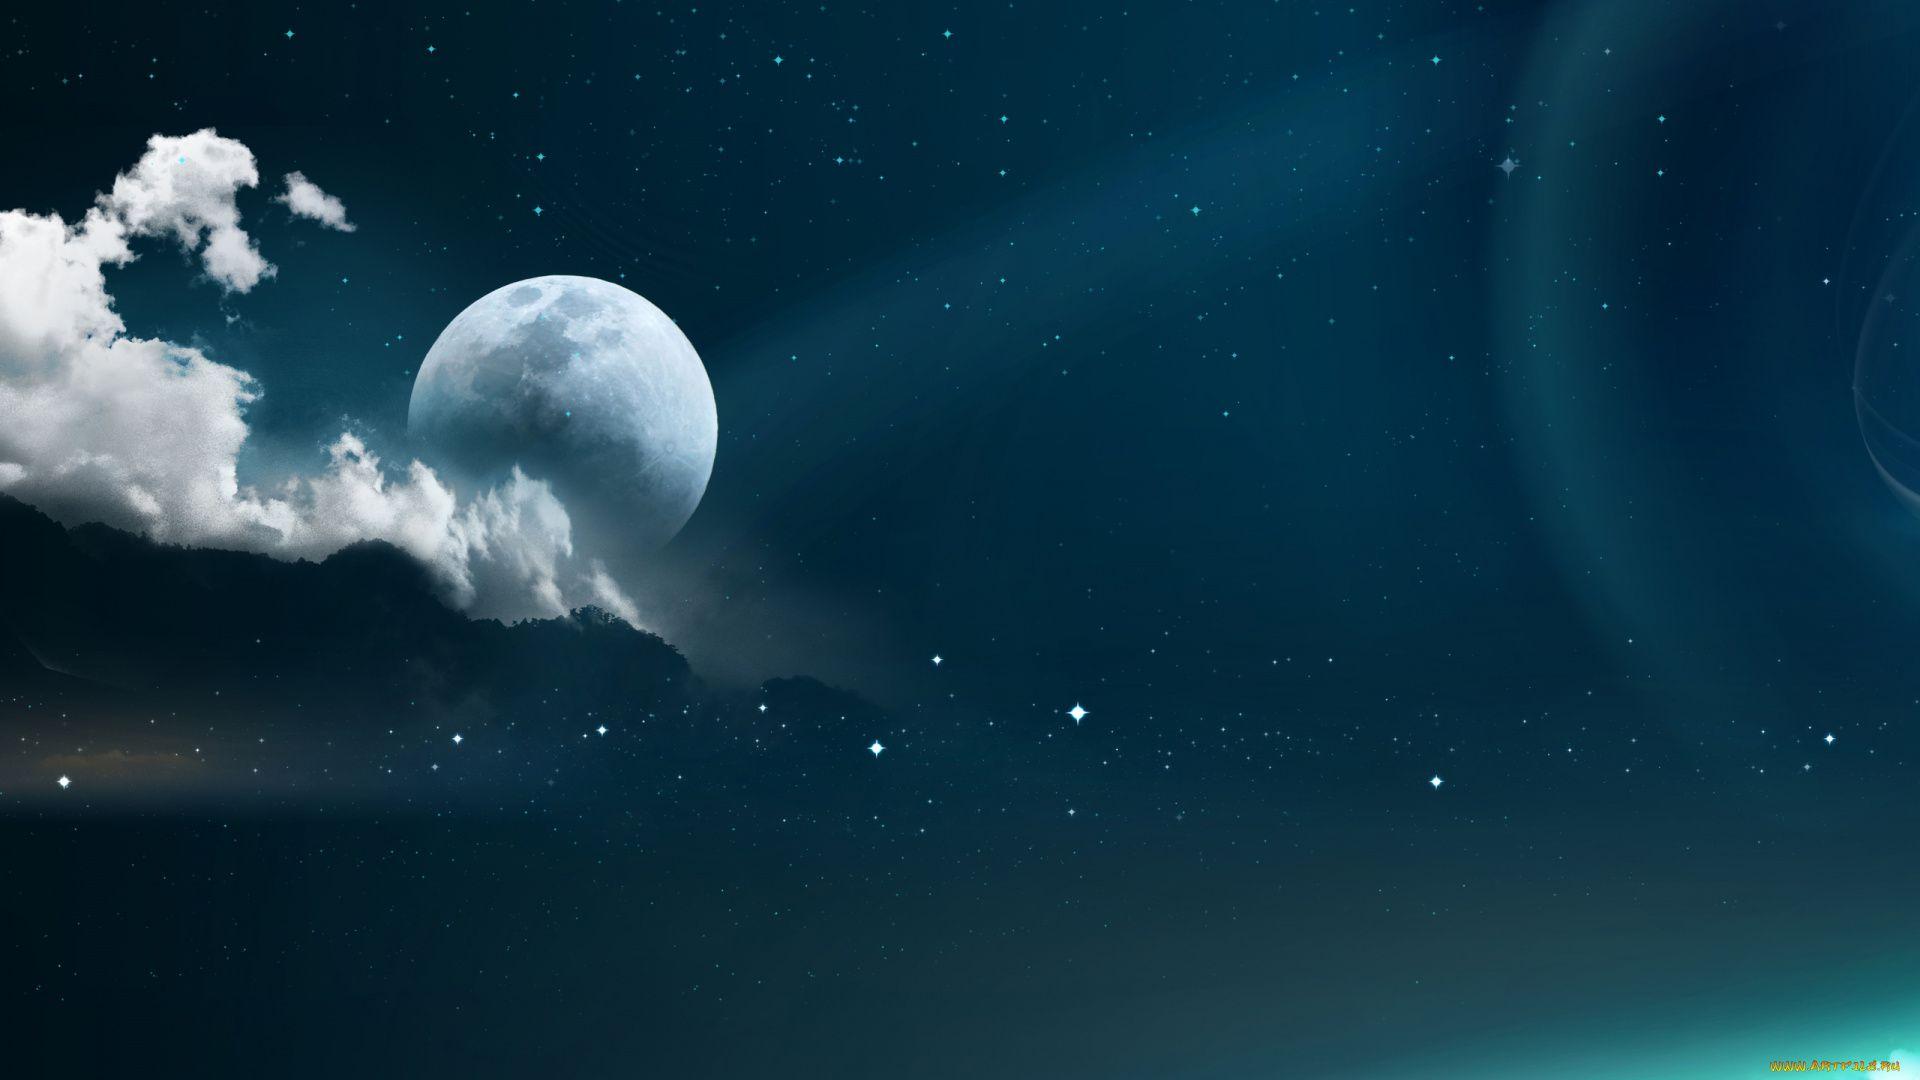 Moon Cool Wallpaper